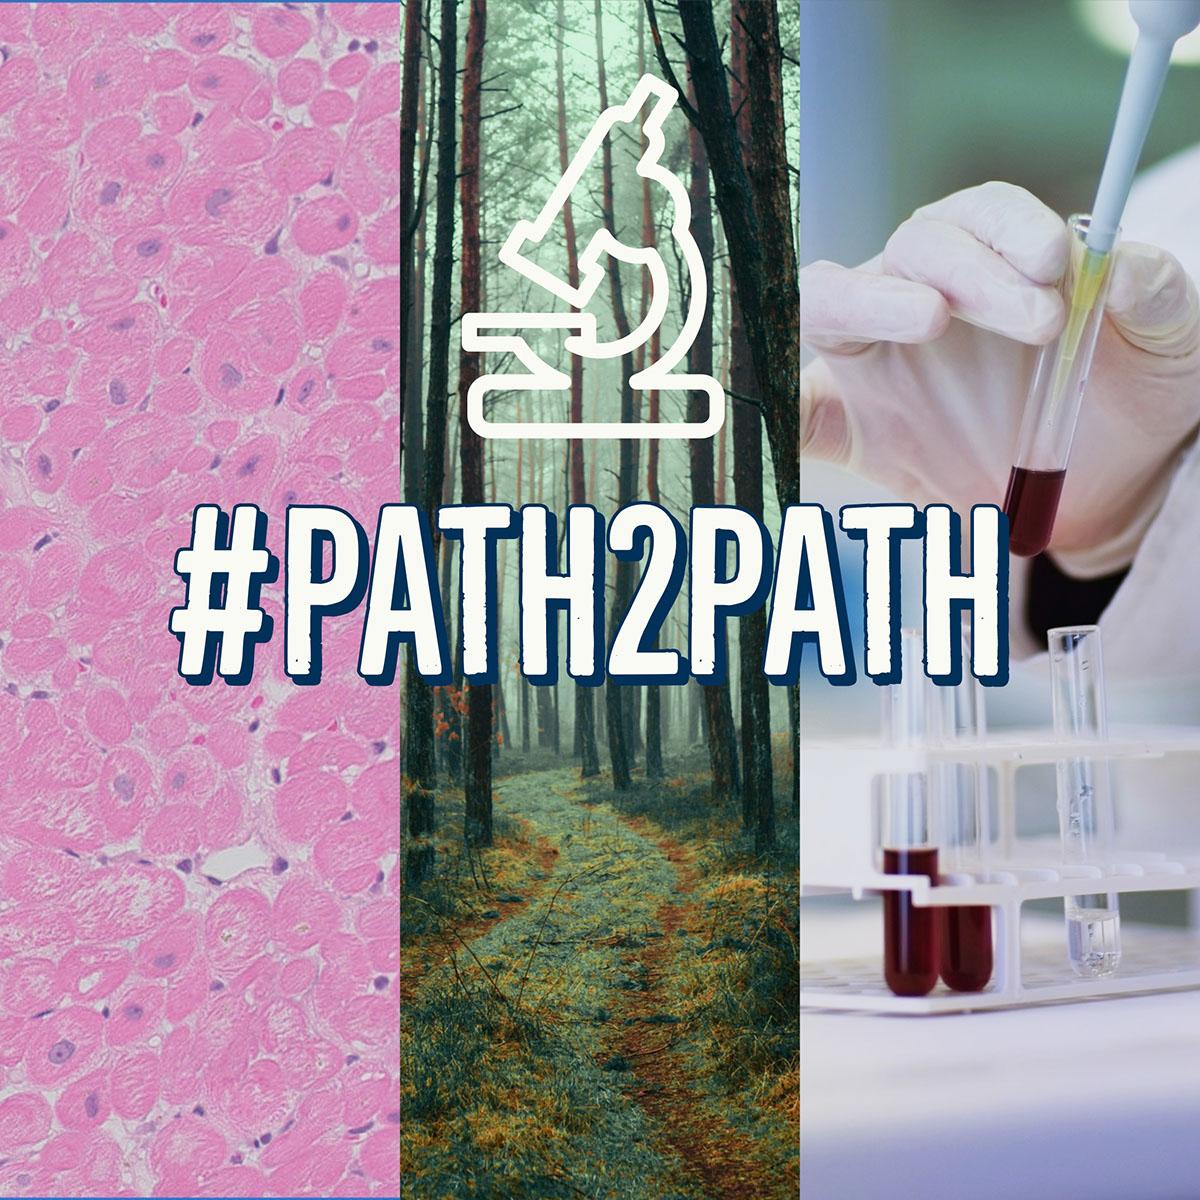 Path2Path